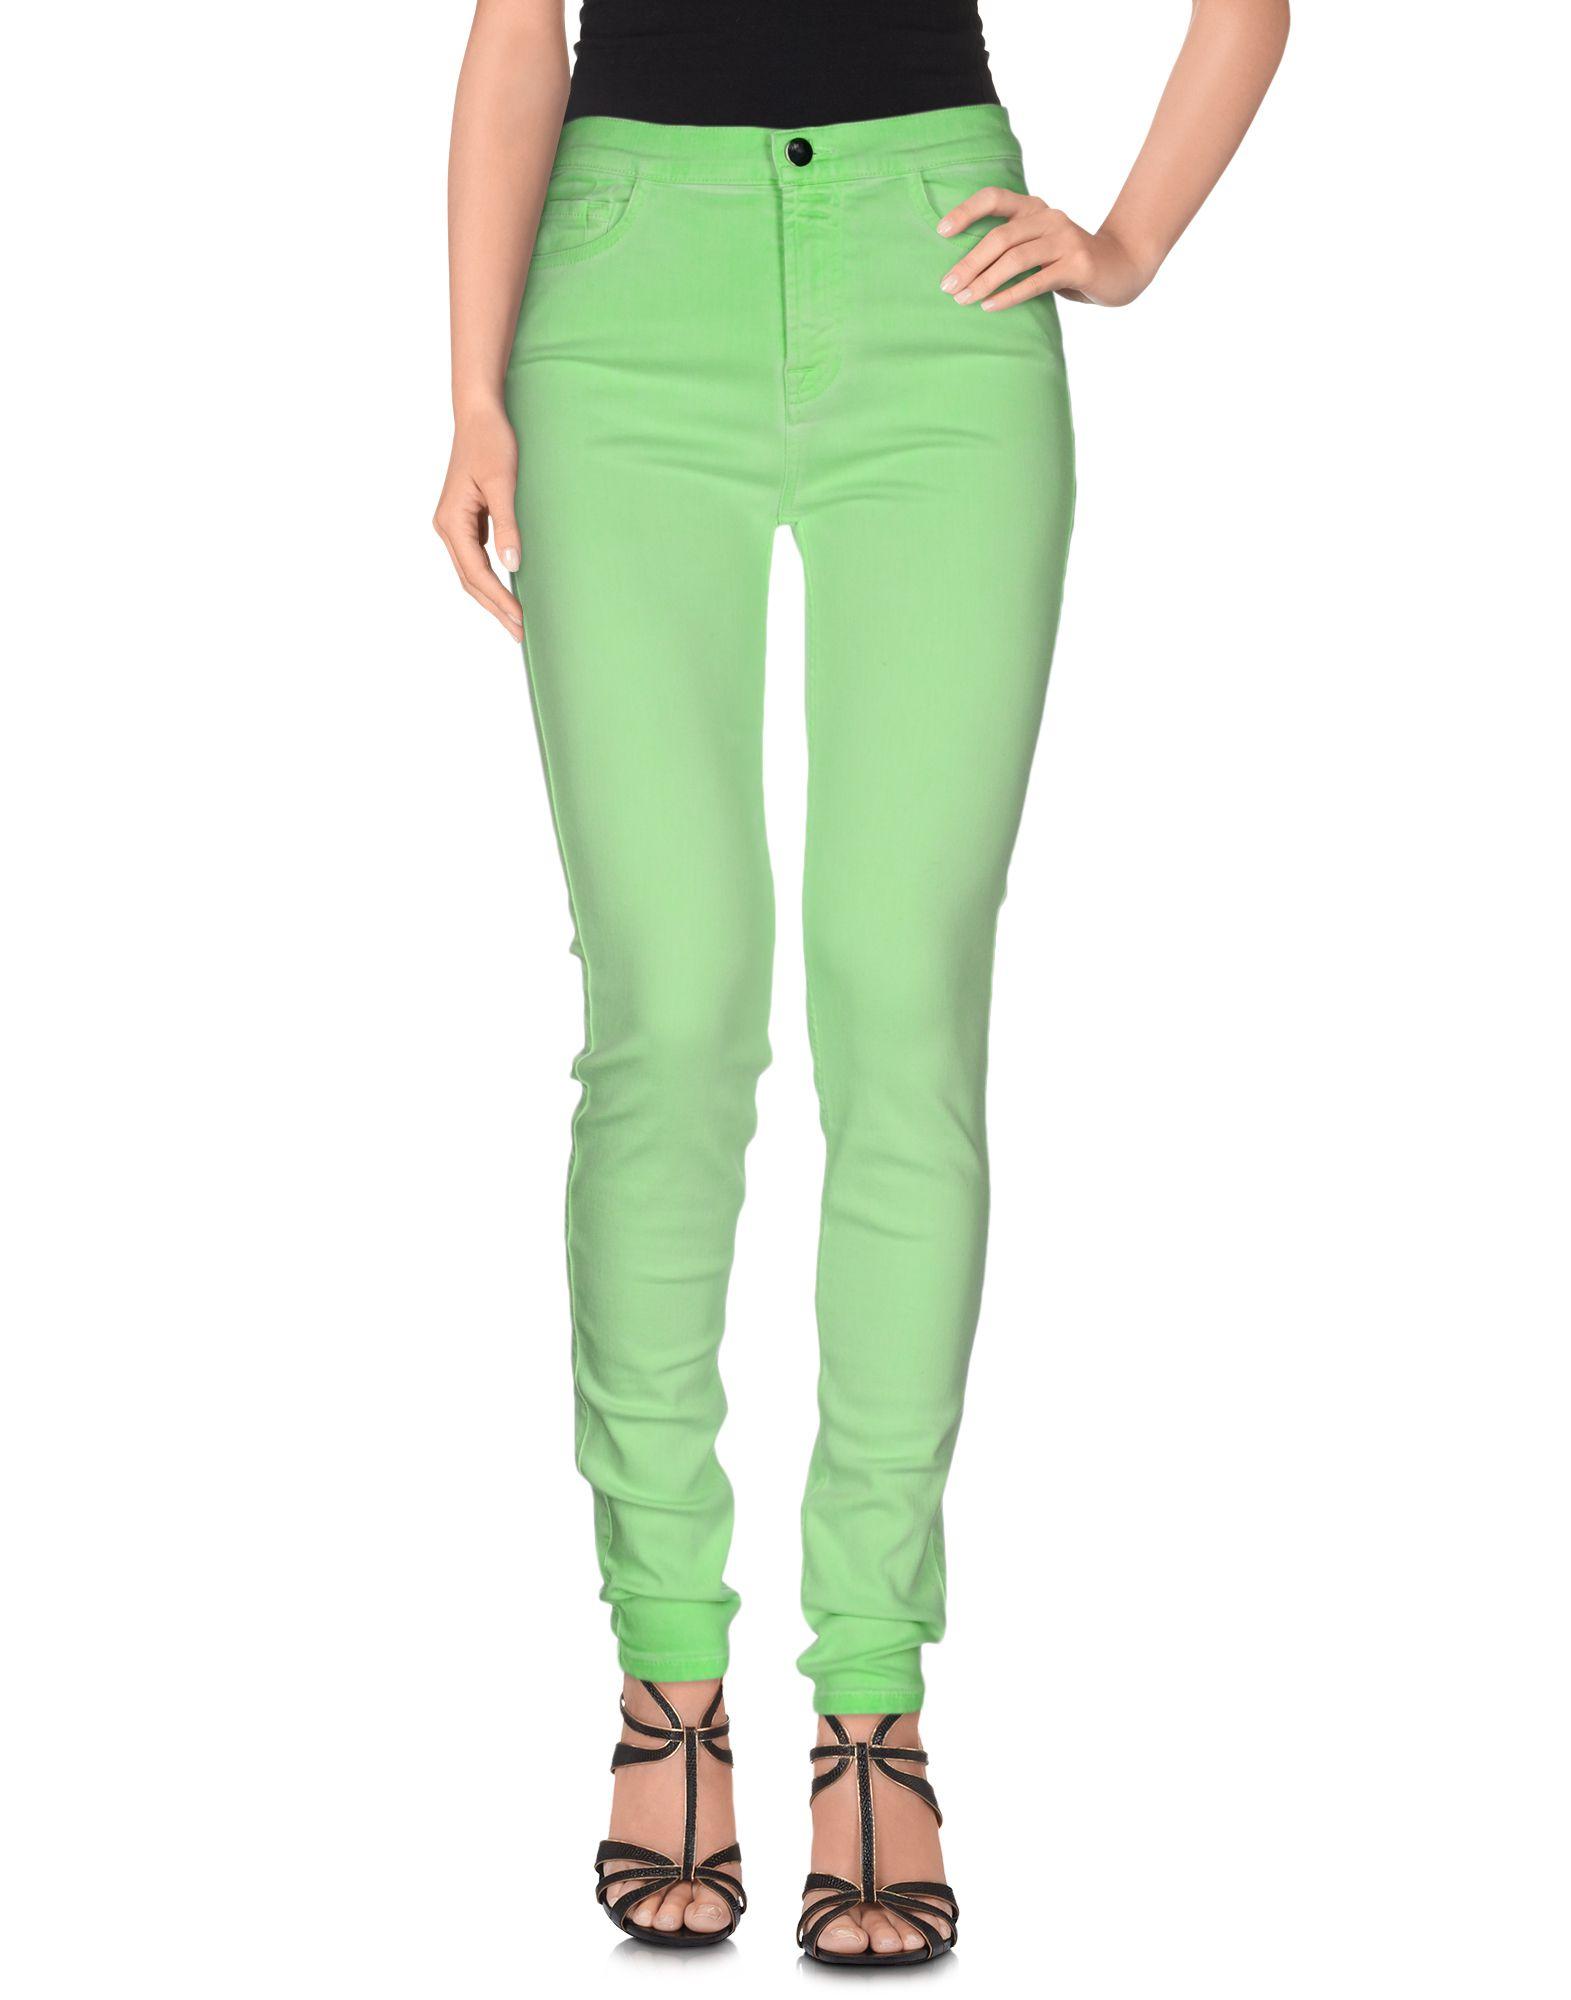 GIAMBATTISTA VALLI for 7 FOR ALL MANKIND Джинсовые брюки 7 for all mankind джинсовые брюки